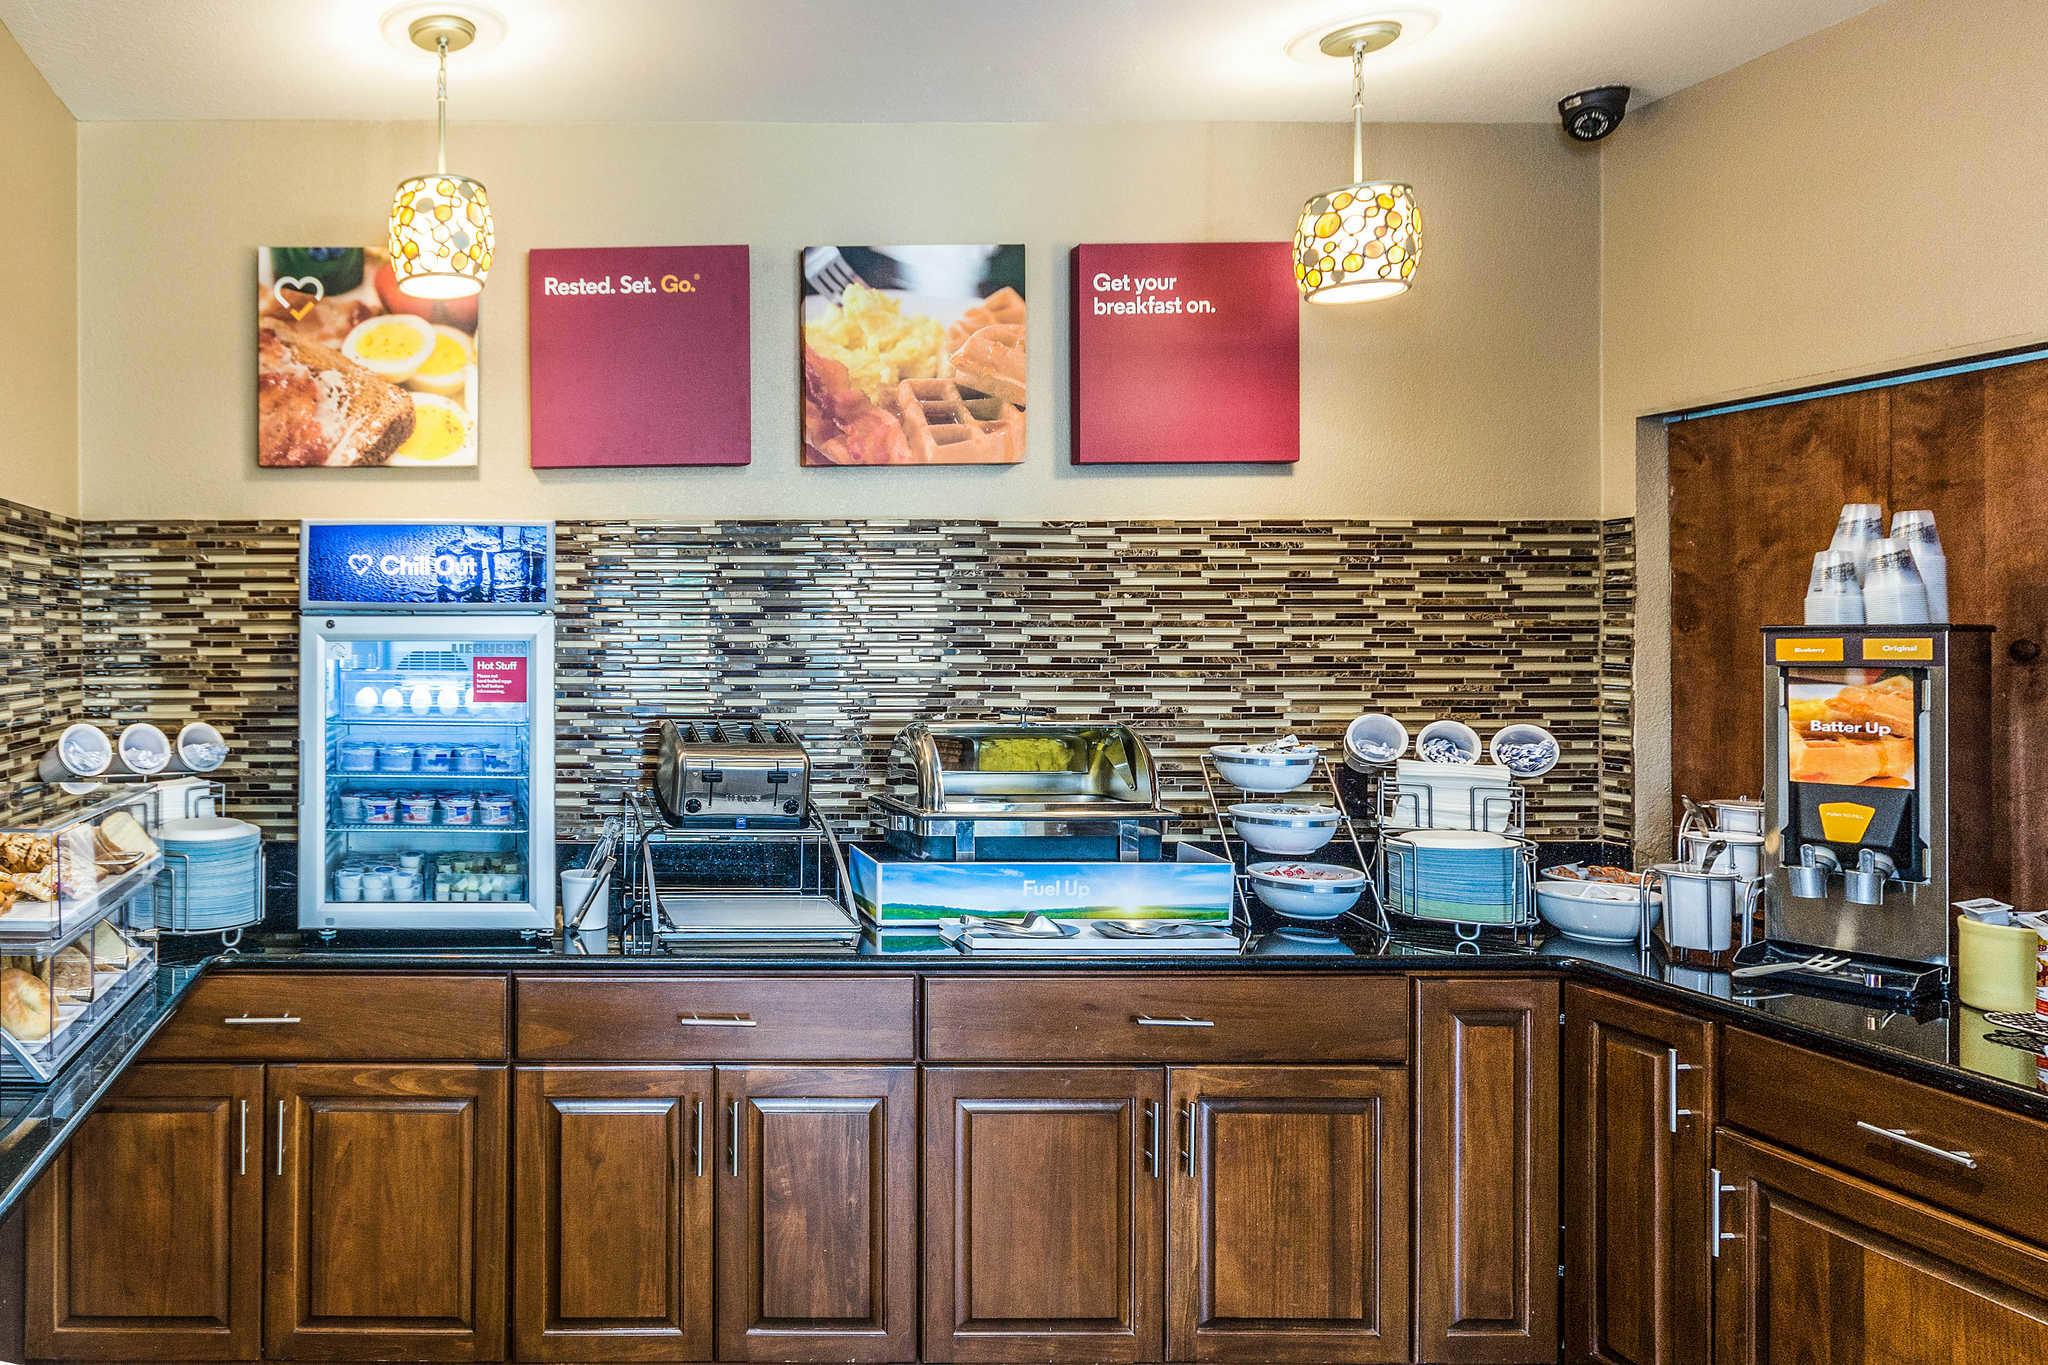 Comfort Inn & Suites North Aurora - Naperville image 32